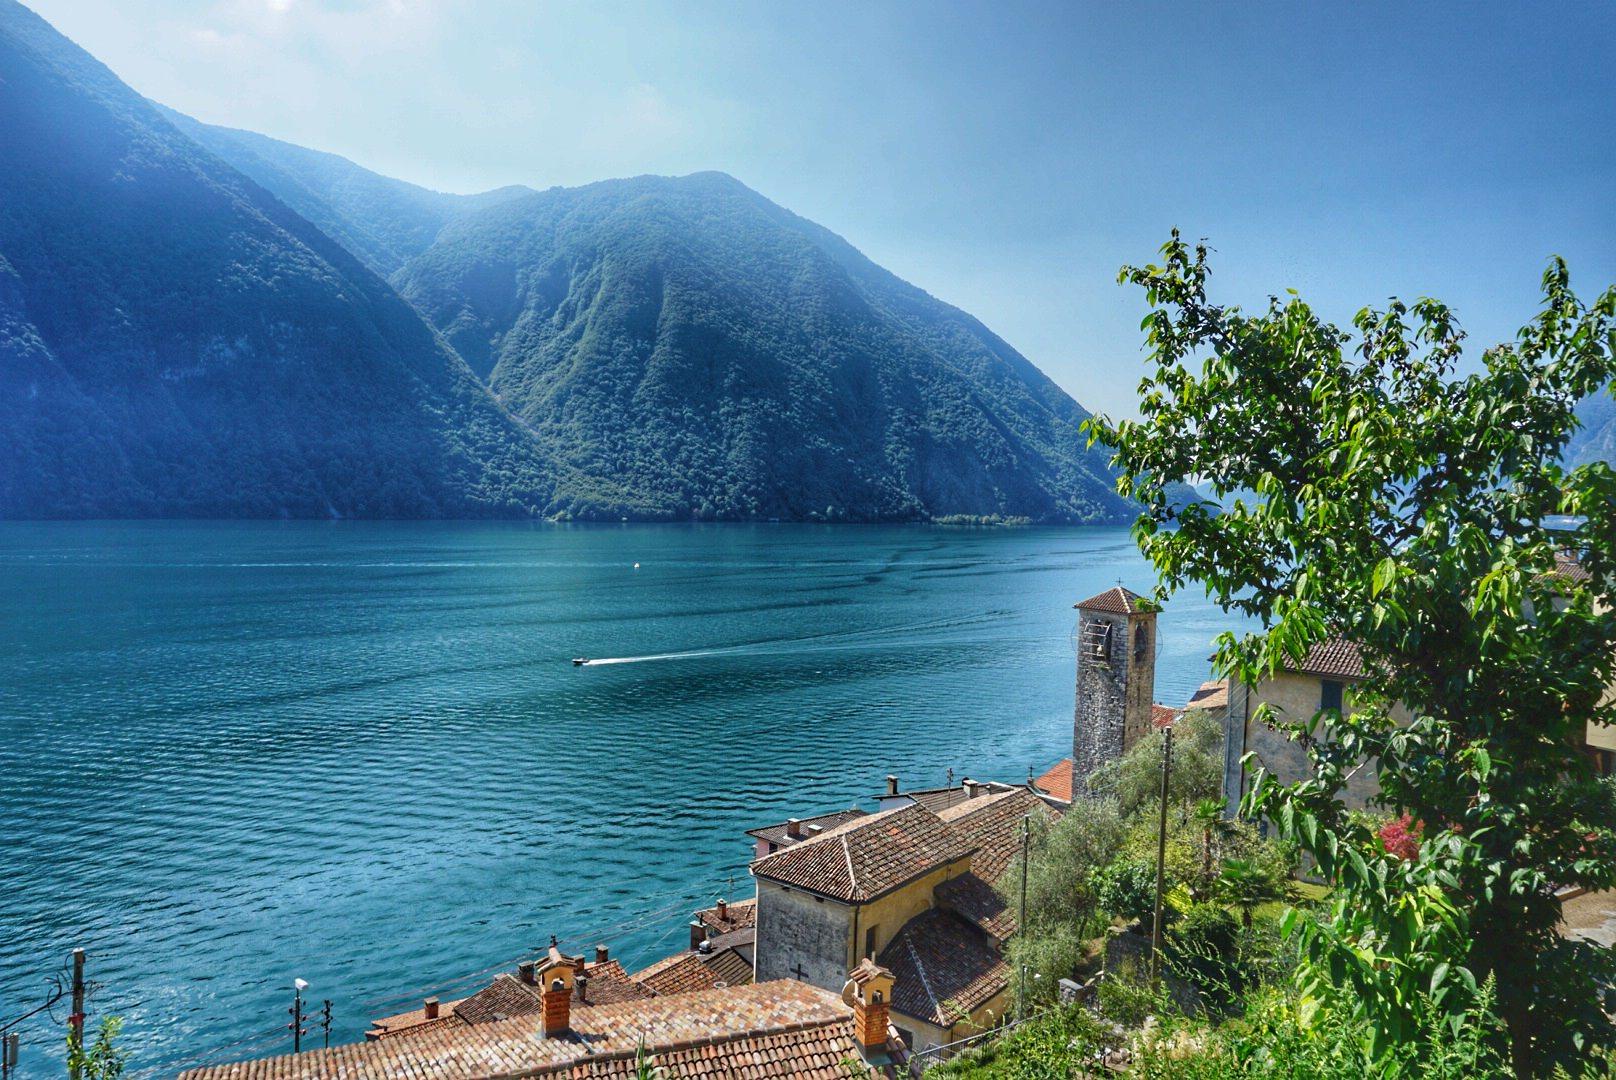 Day trip to Lake Lugano – Switzerland